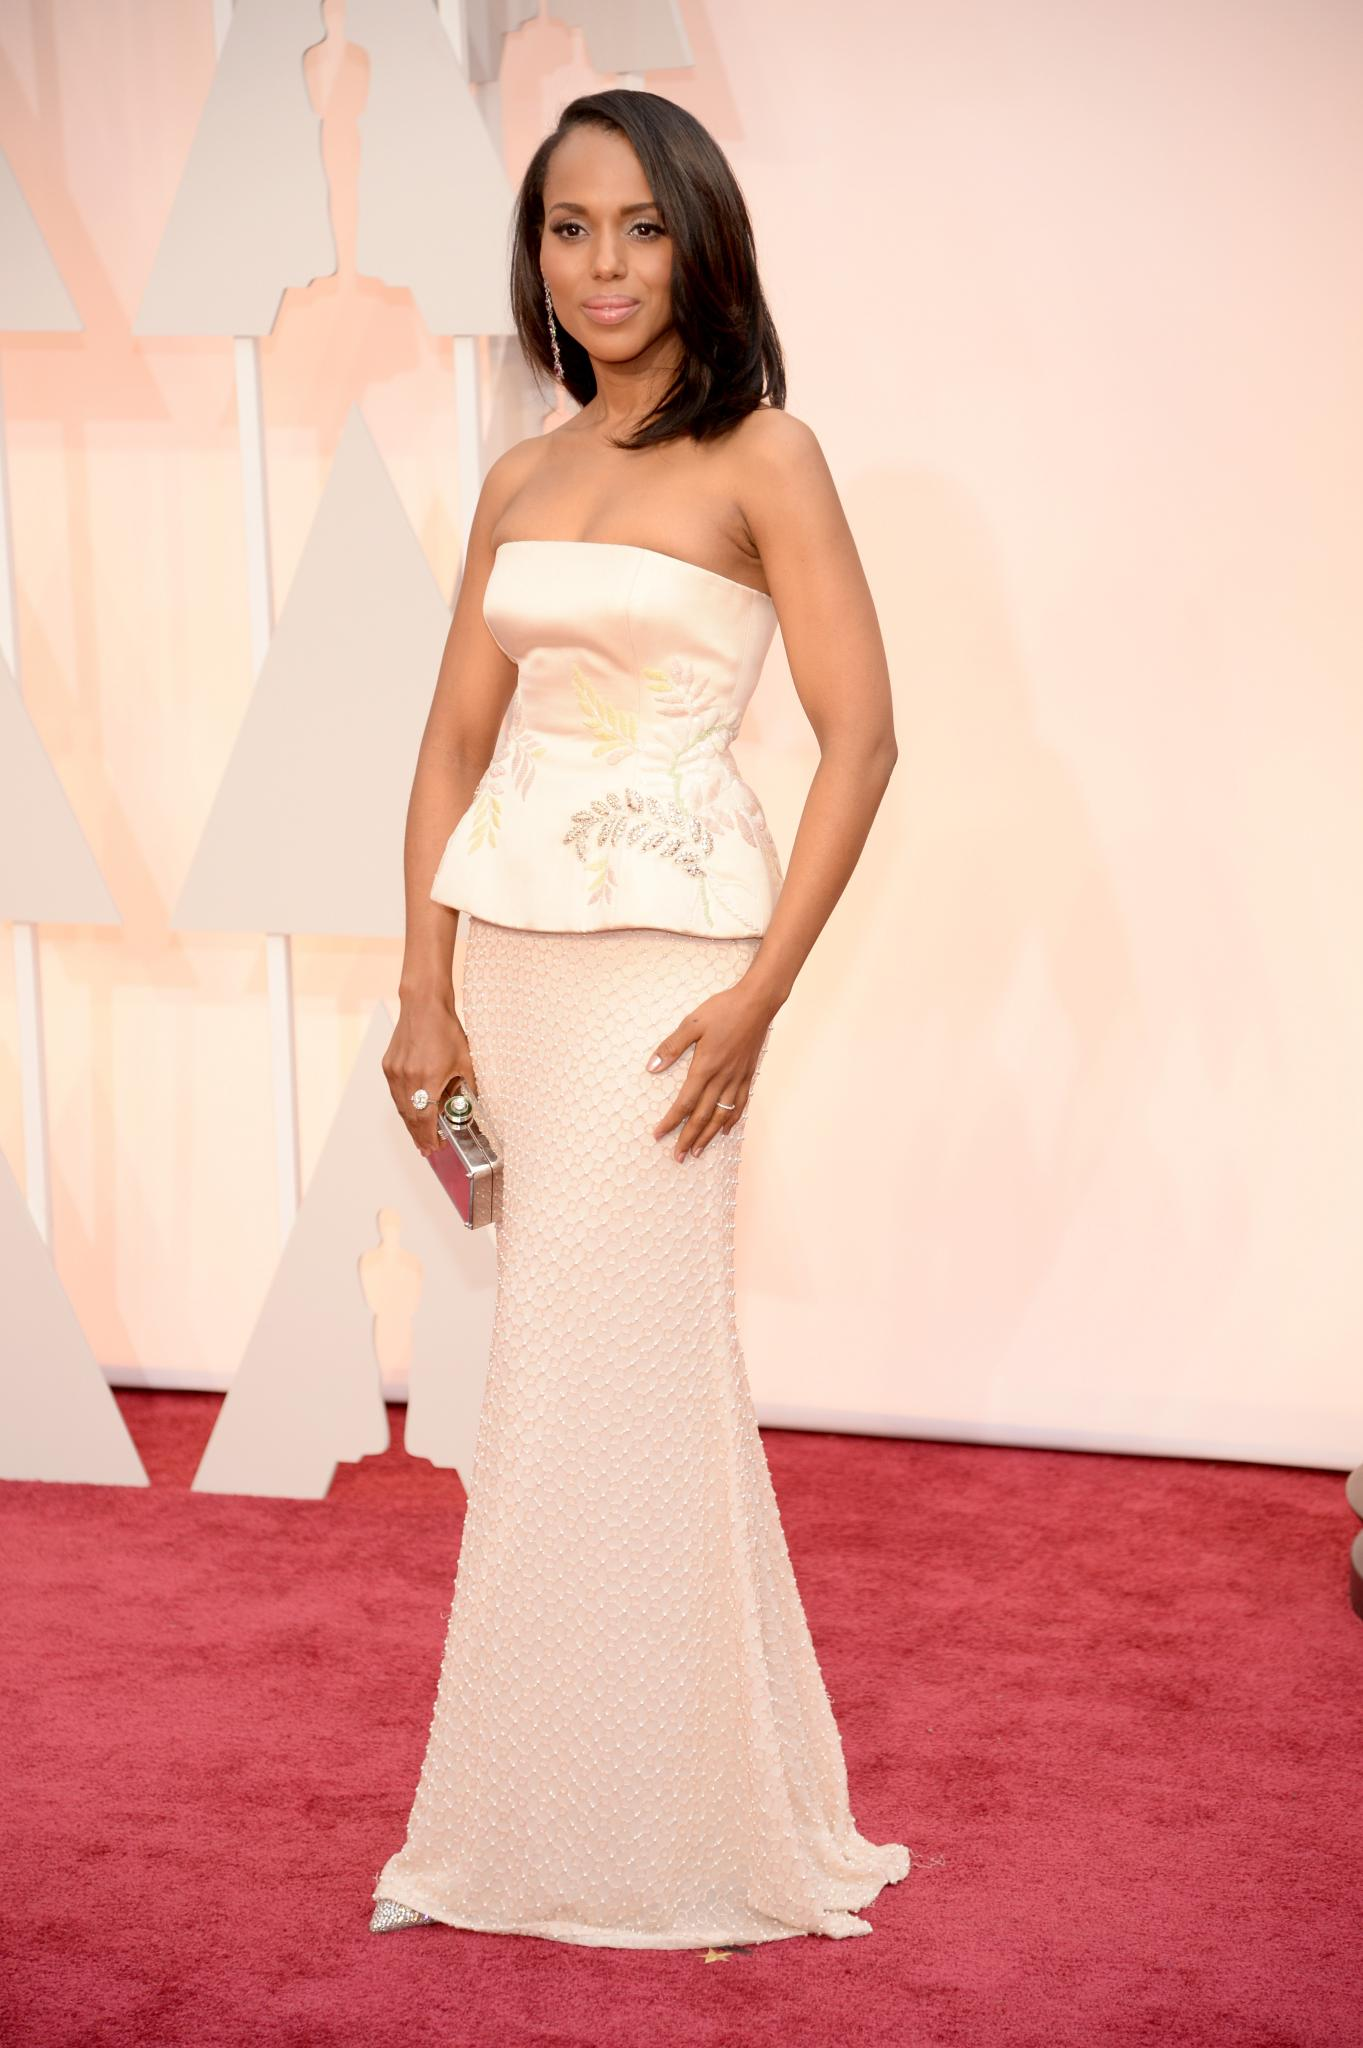 Quincy Jones, Kerry Washington Added as Oscar Presenters